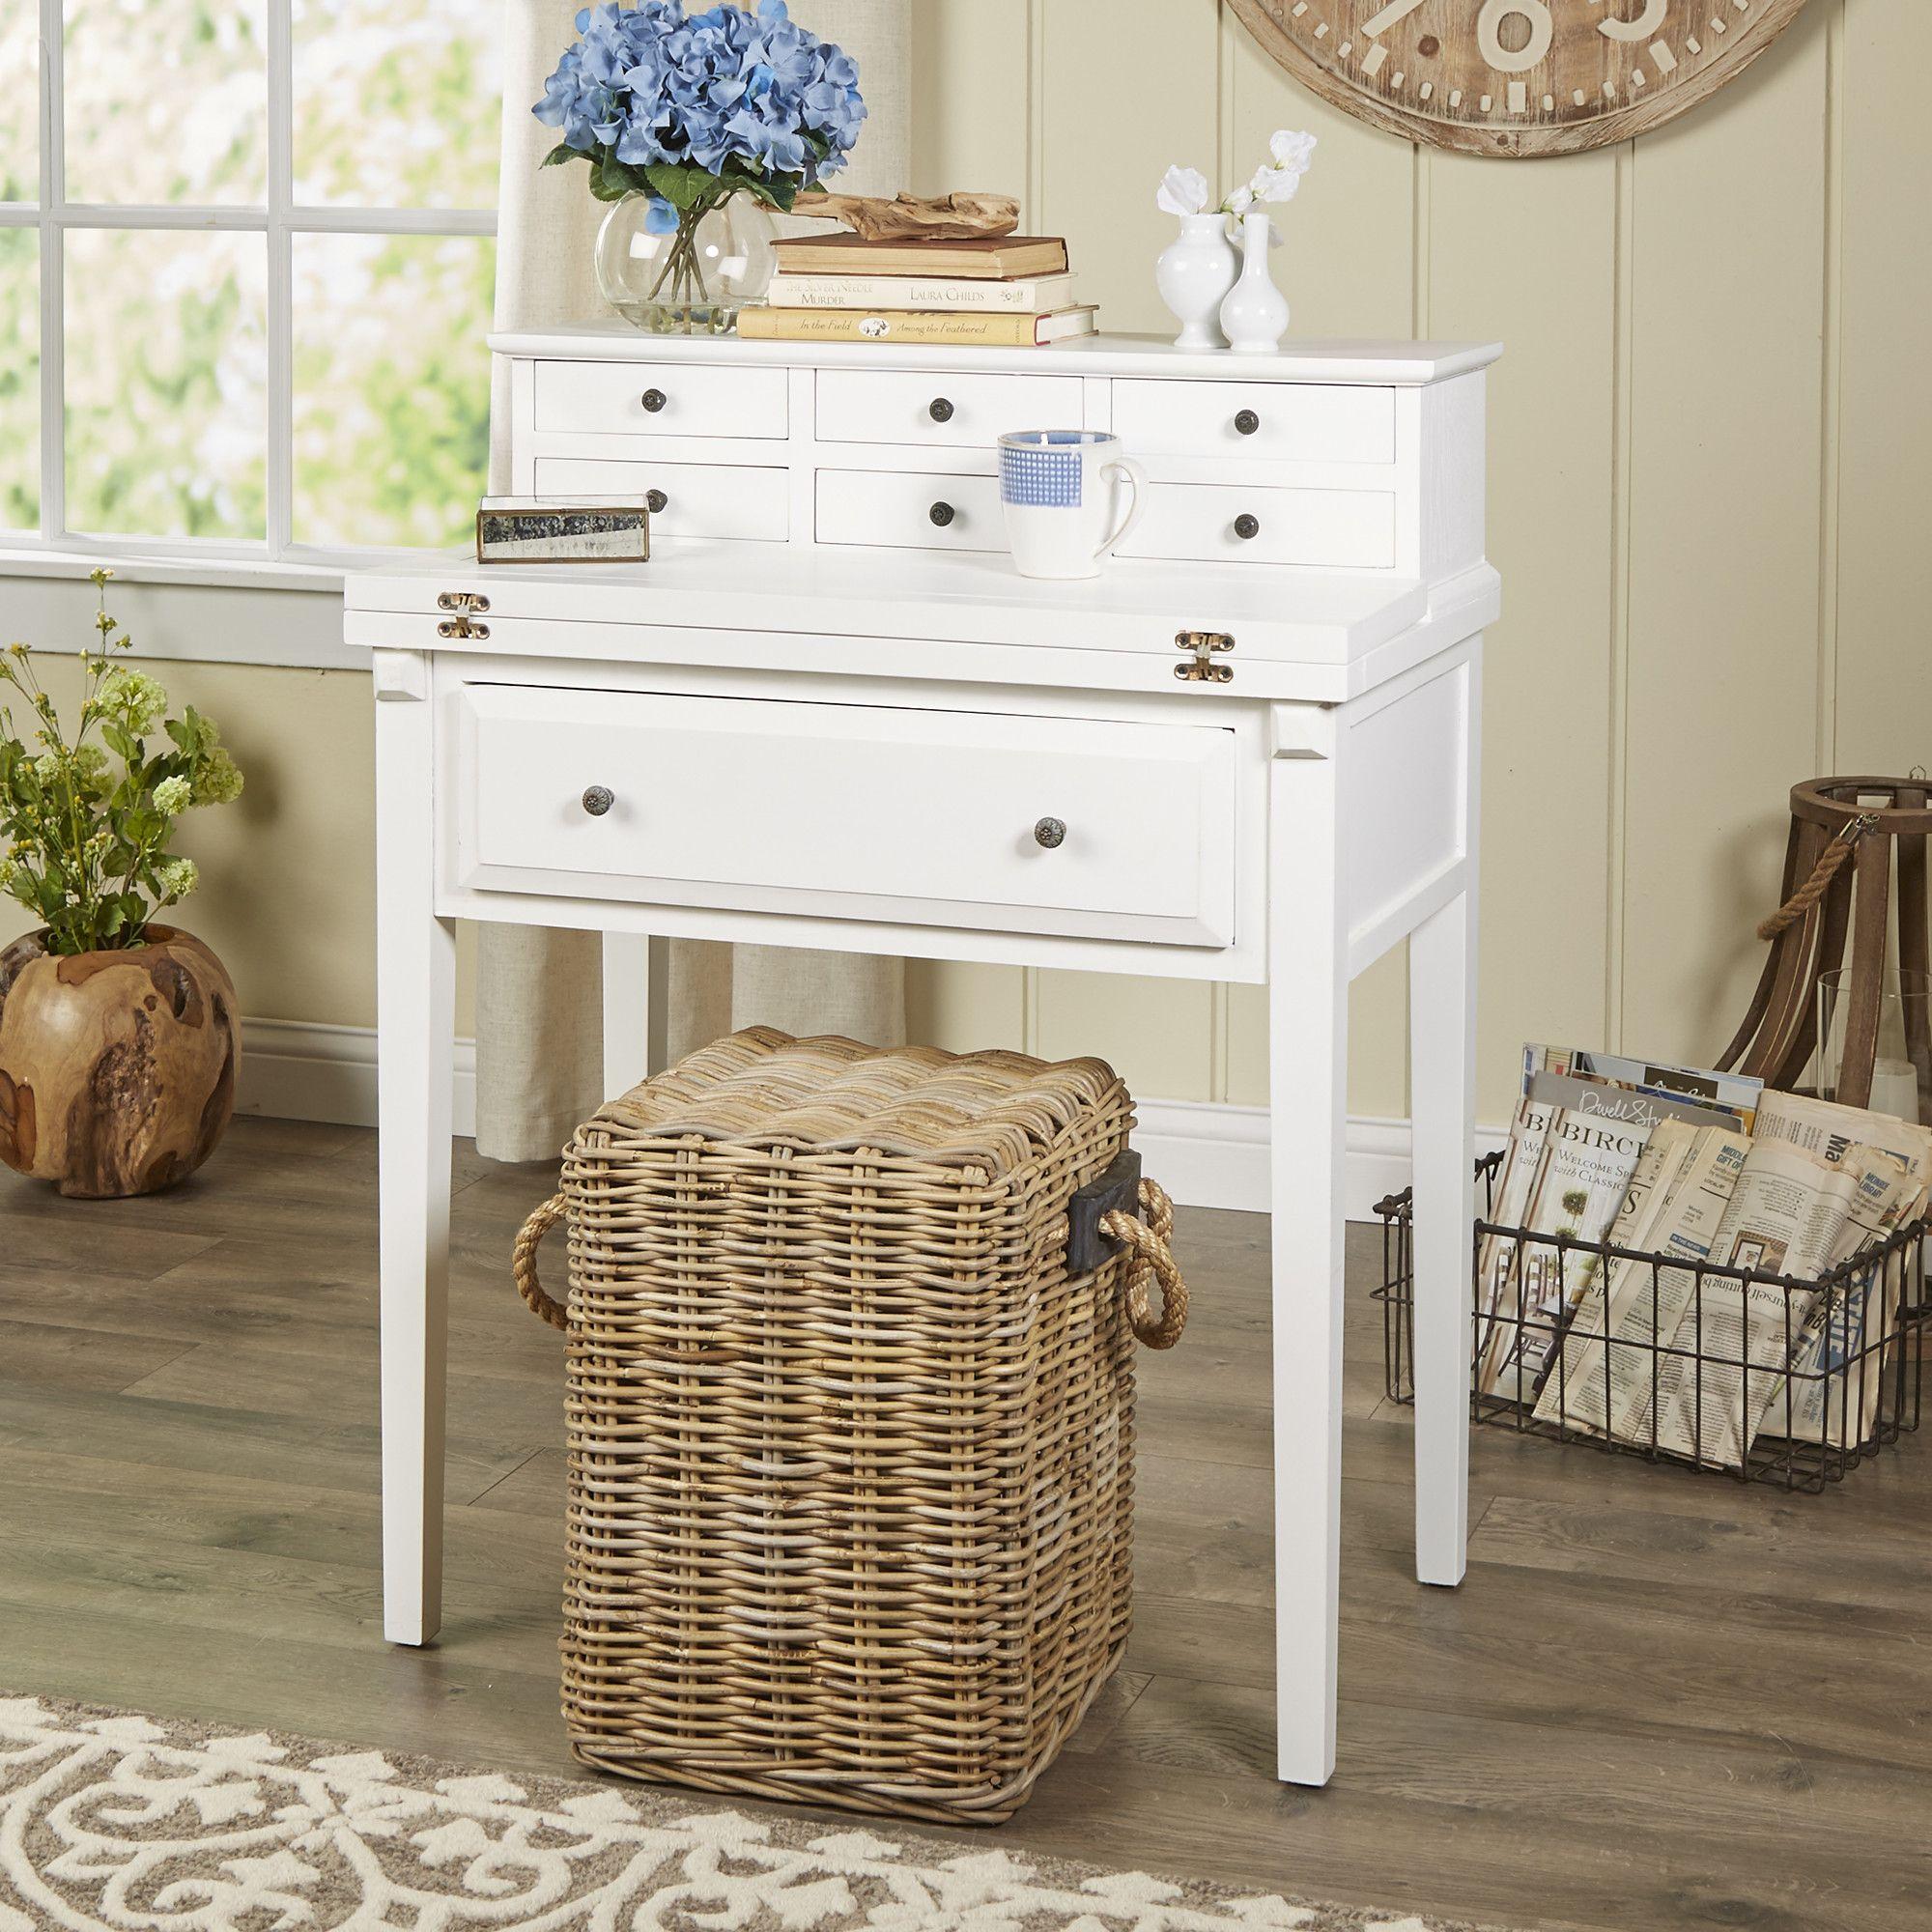 Lark manor paras arm chair amp reviews wayfair ca - Bedrooms